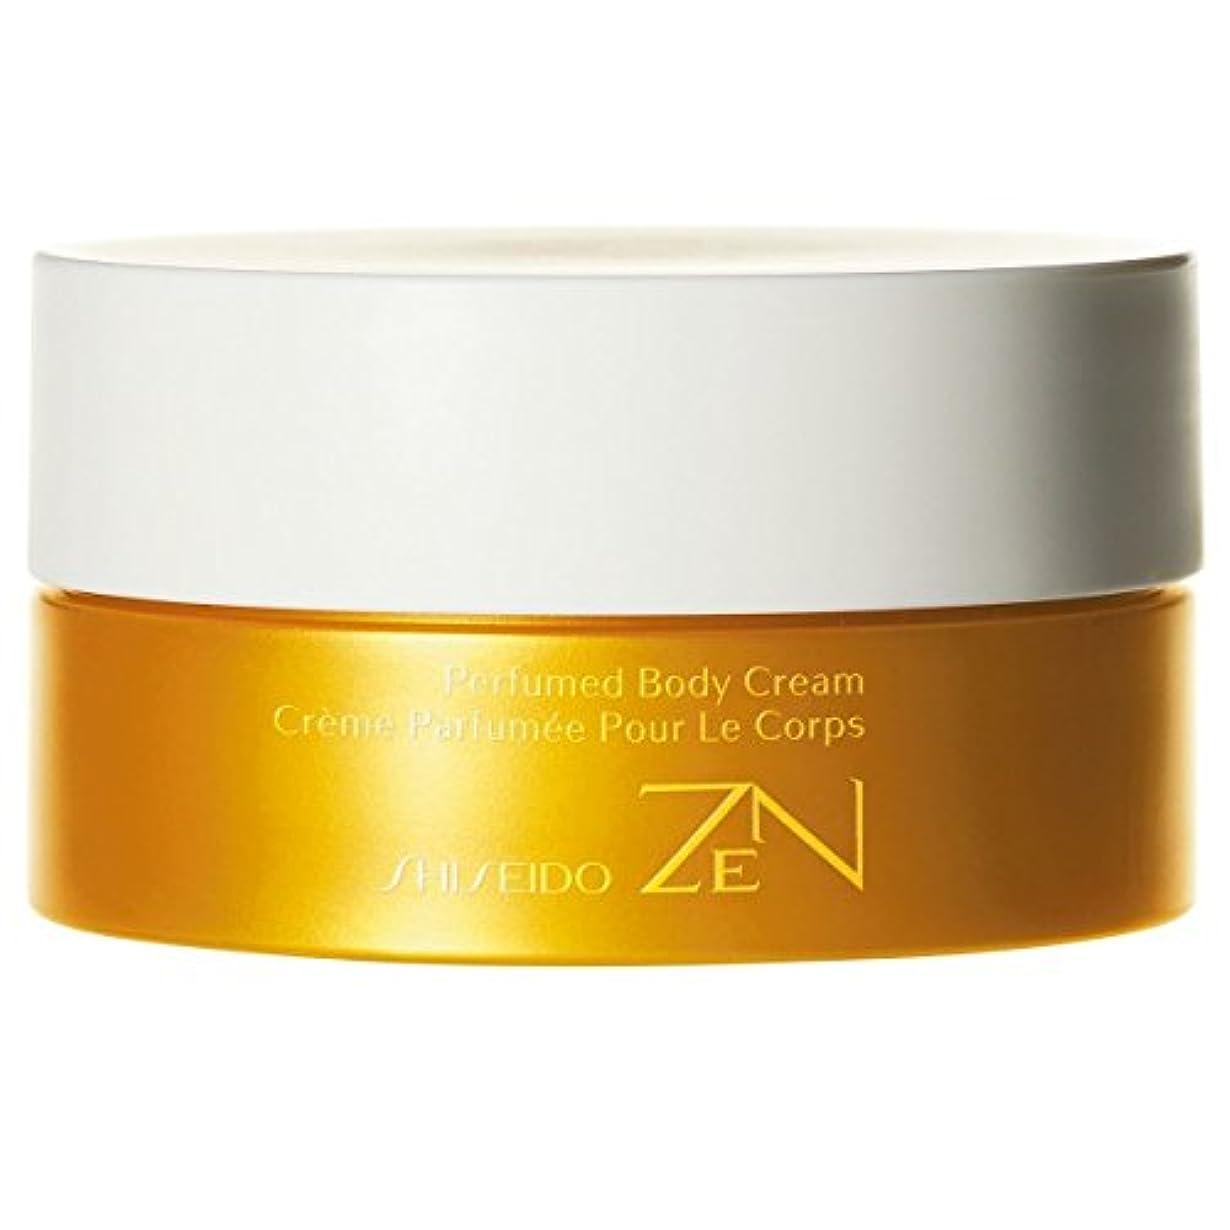 [Shiseido ] 資生堂禅香りのボディクリーム200ミリリットル - Shiseido Zen Perfumed Body Cream 200ml [並行輸入品]